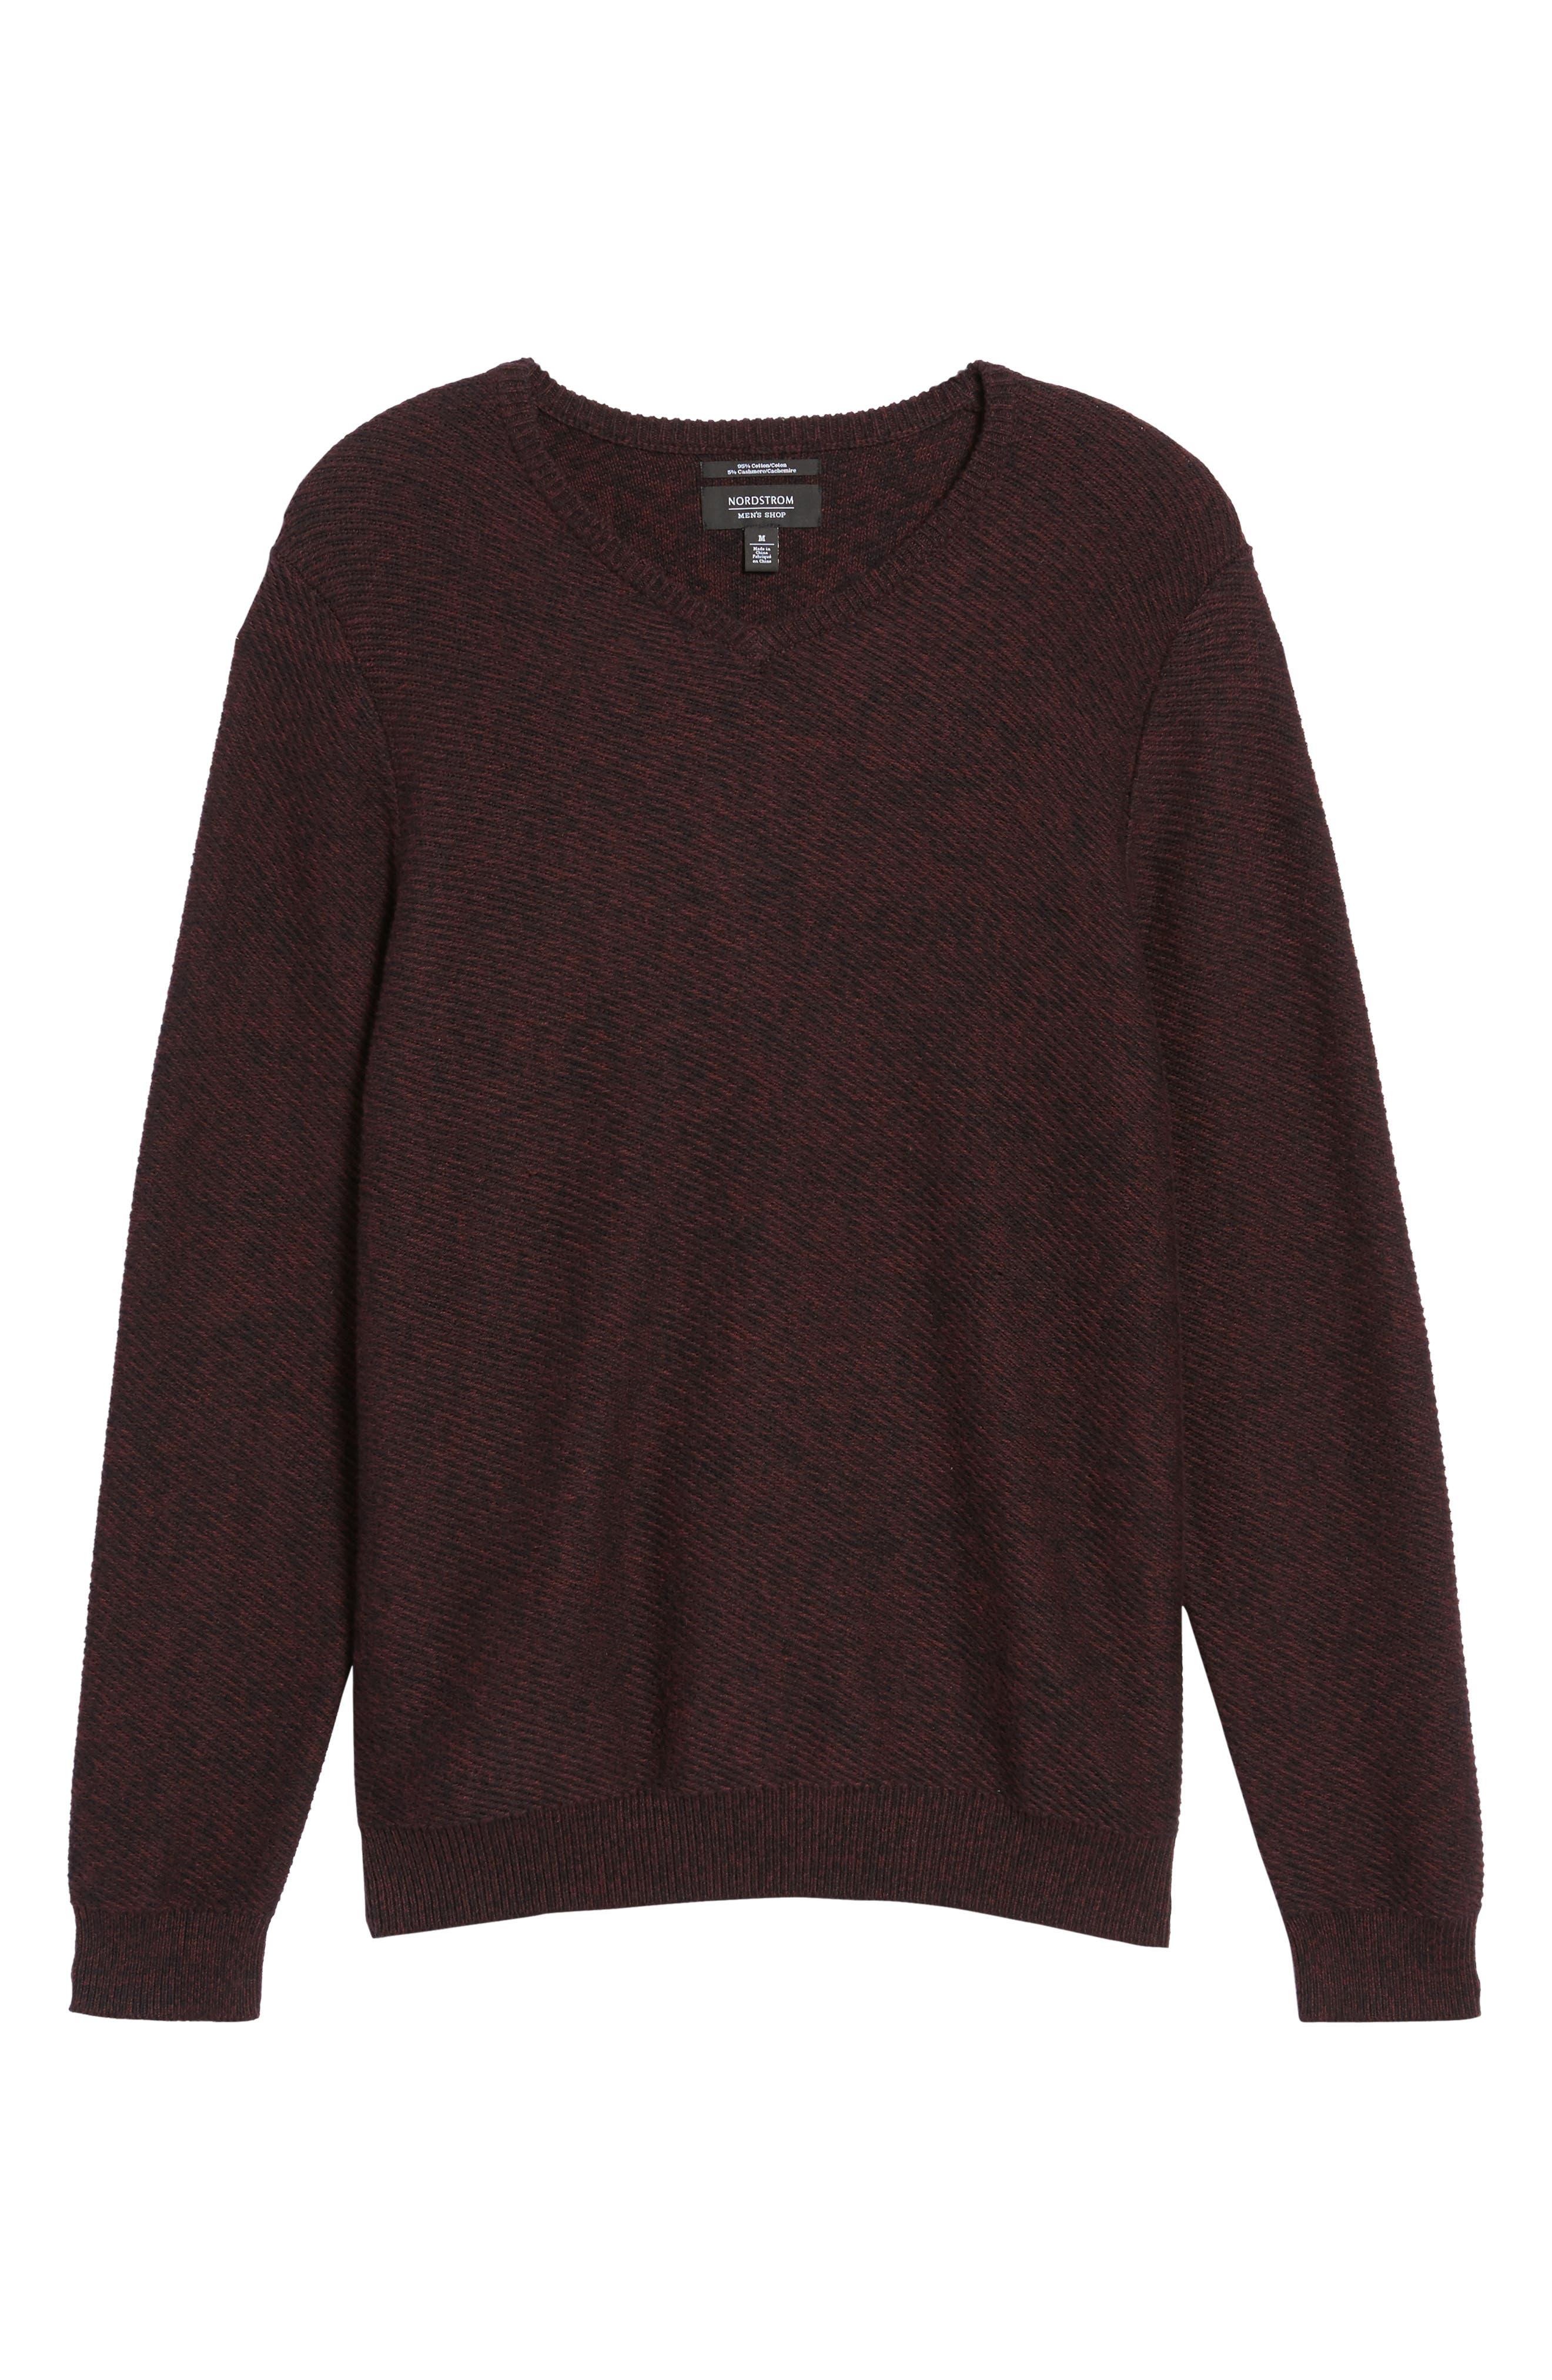 Cotton & Cashmere V-Neck Sweater,                             Alternate thumbnail 11, color,